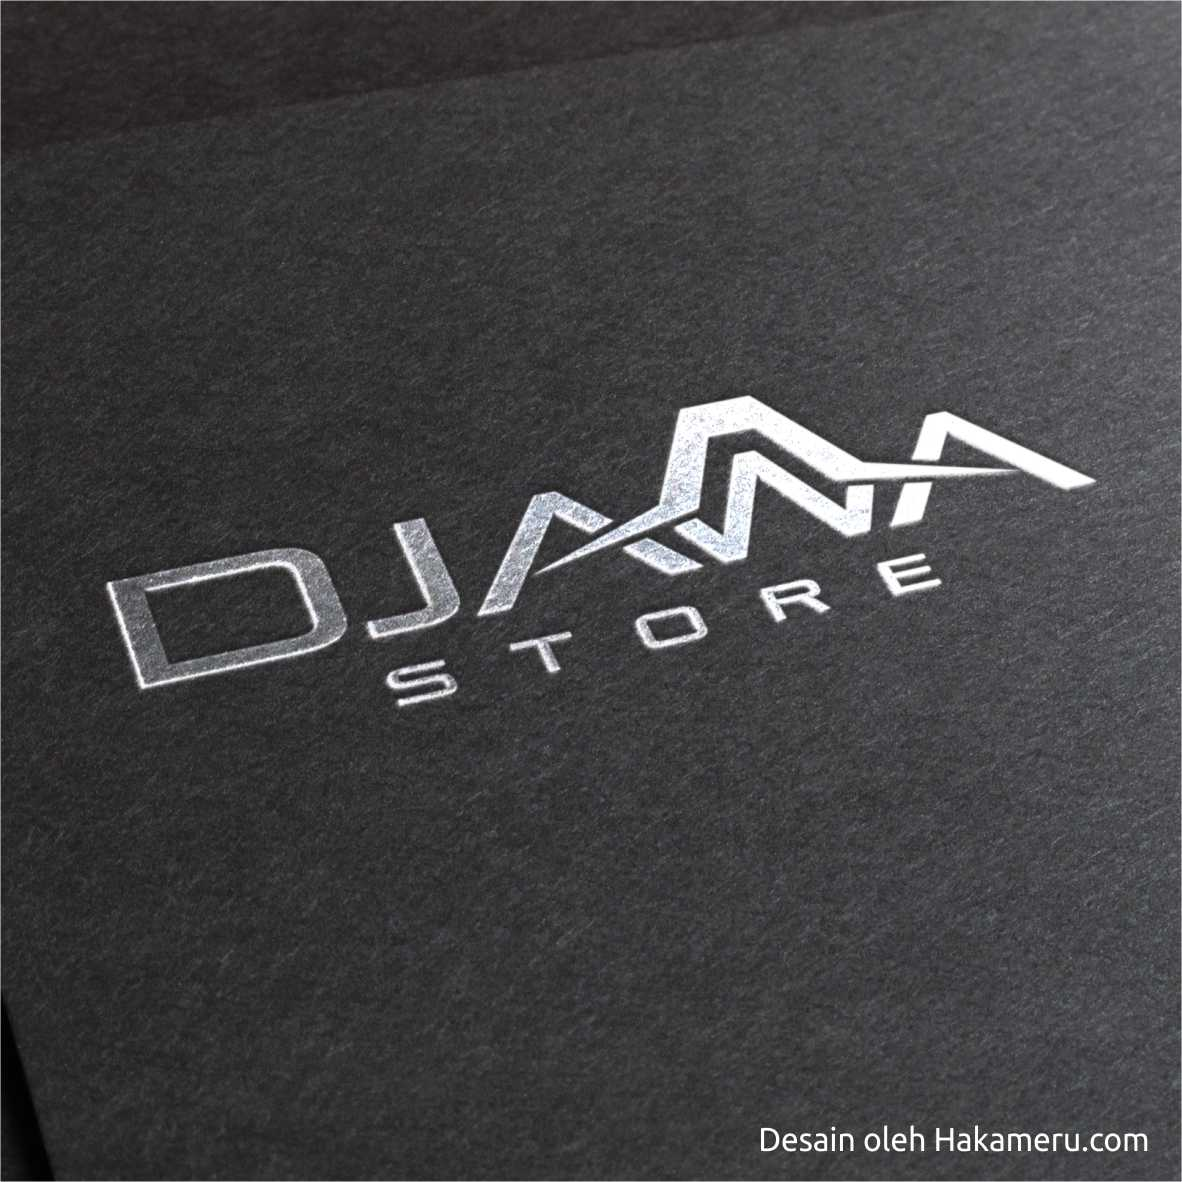 Desain logo untuk online store - toko online Djawa Store - Jasa Desain Grafis Online Hakameru